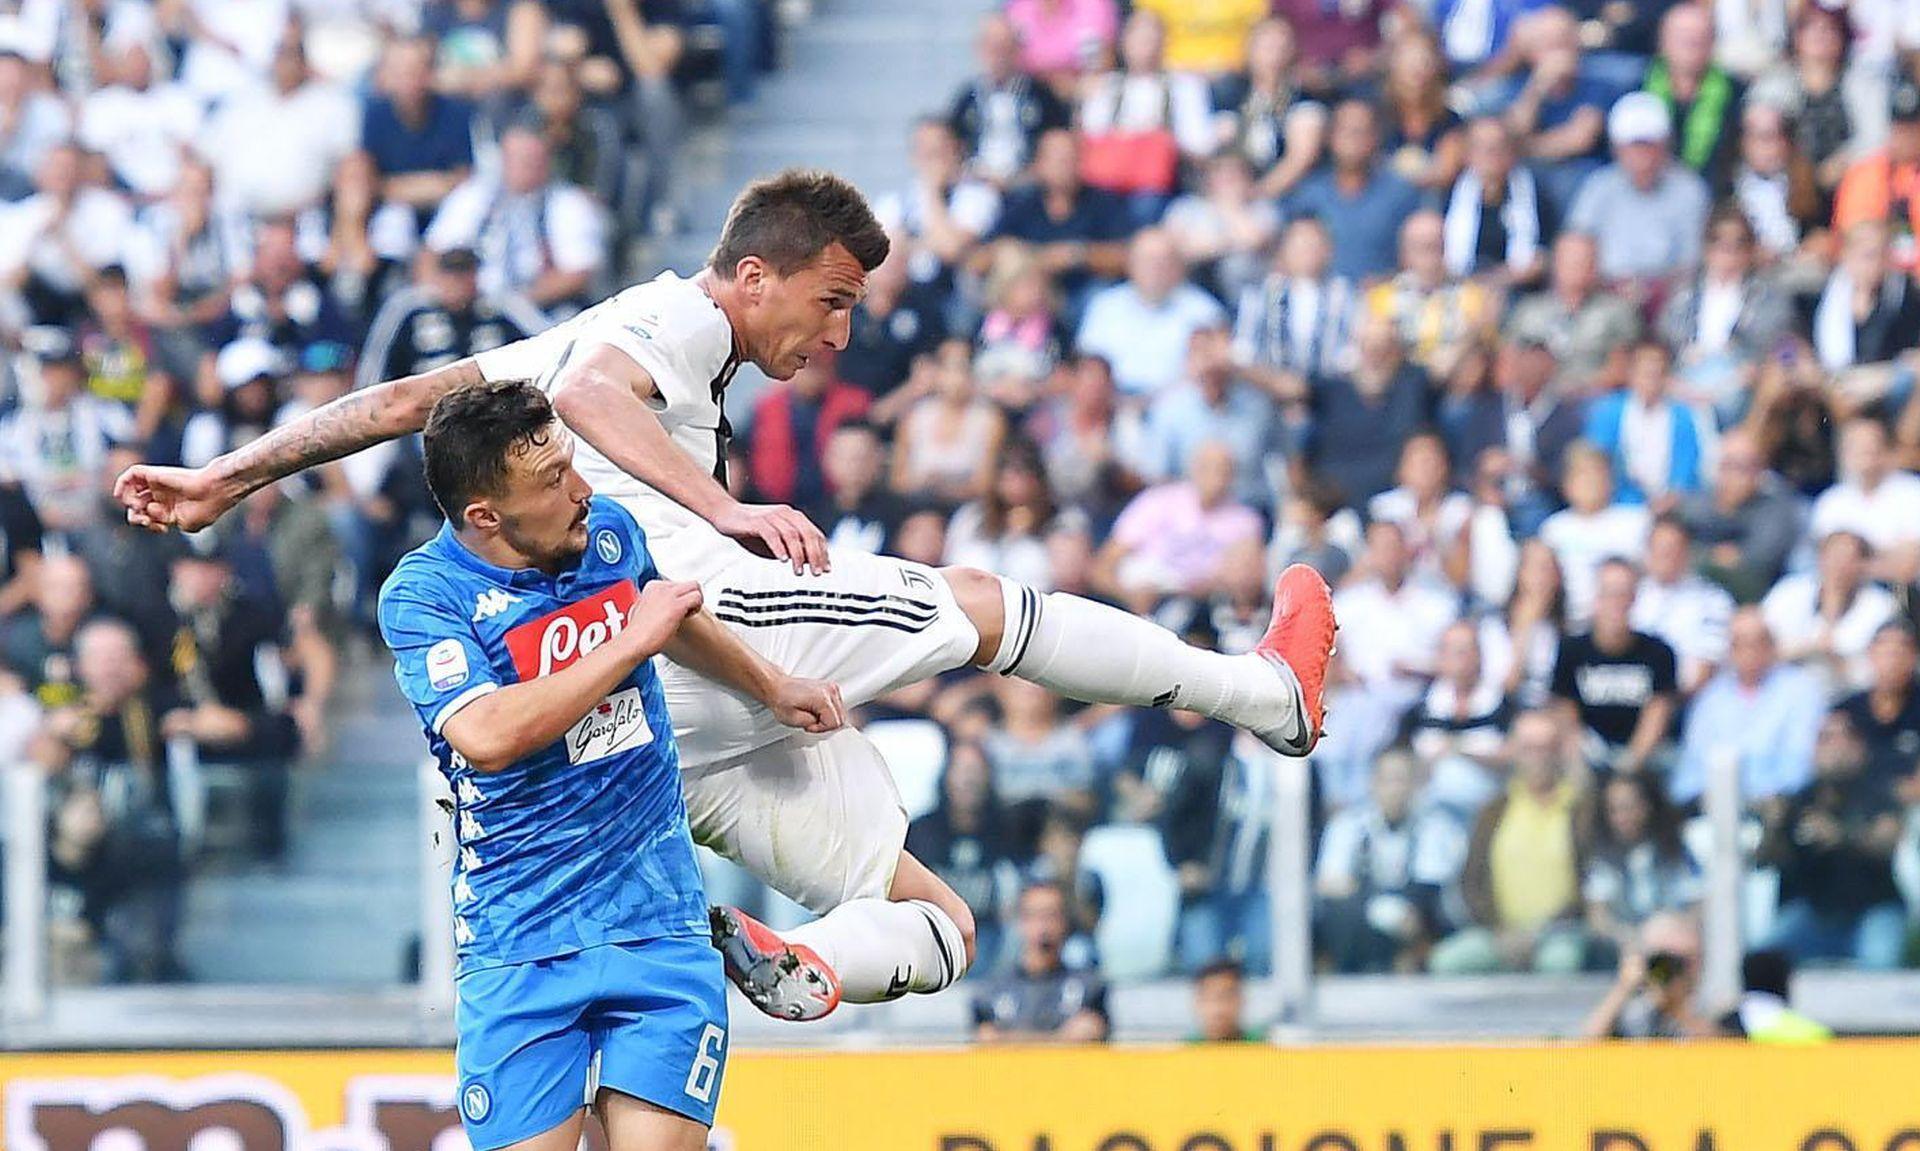 Mandžukić s dva gola srušio Napoli